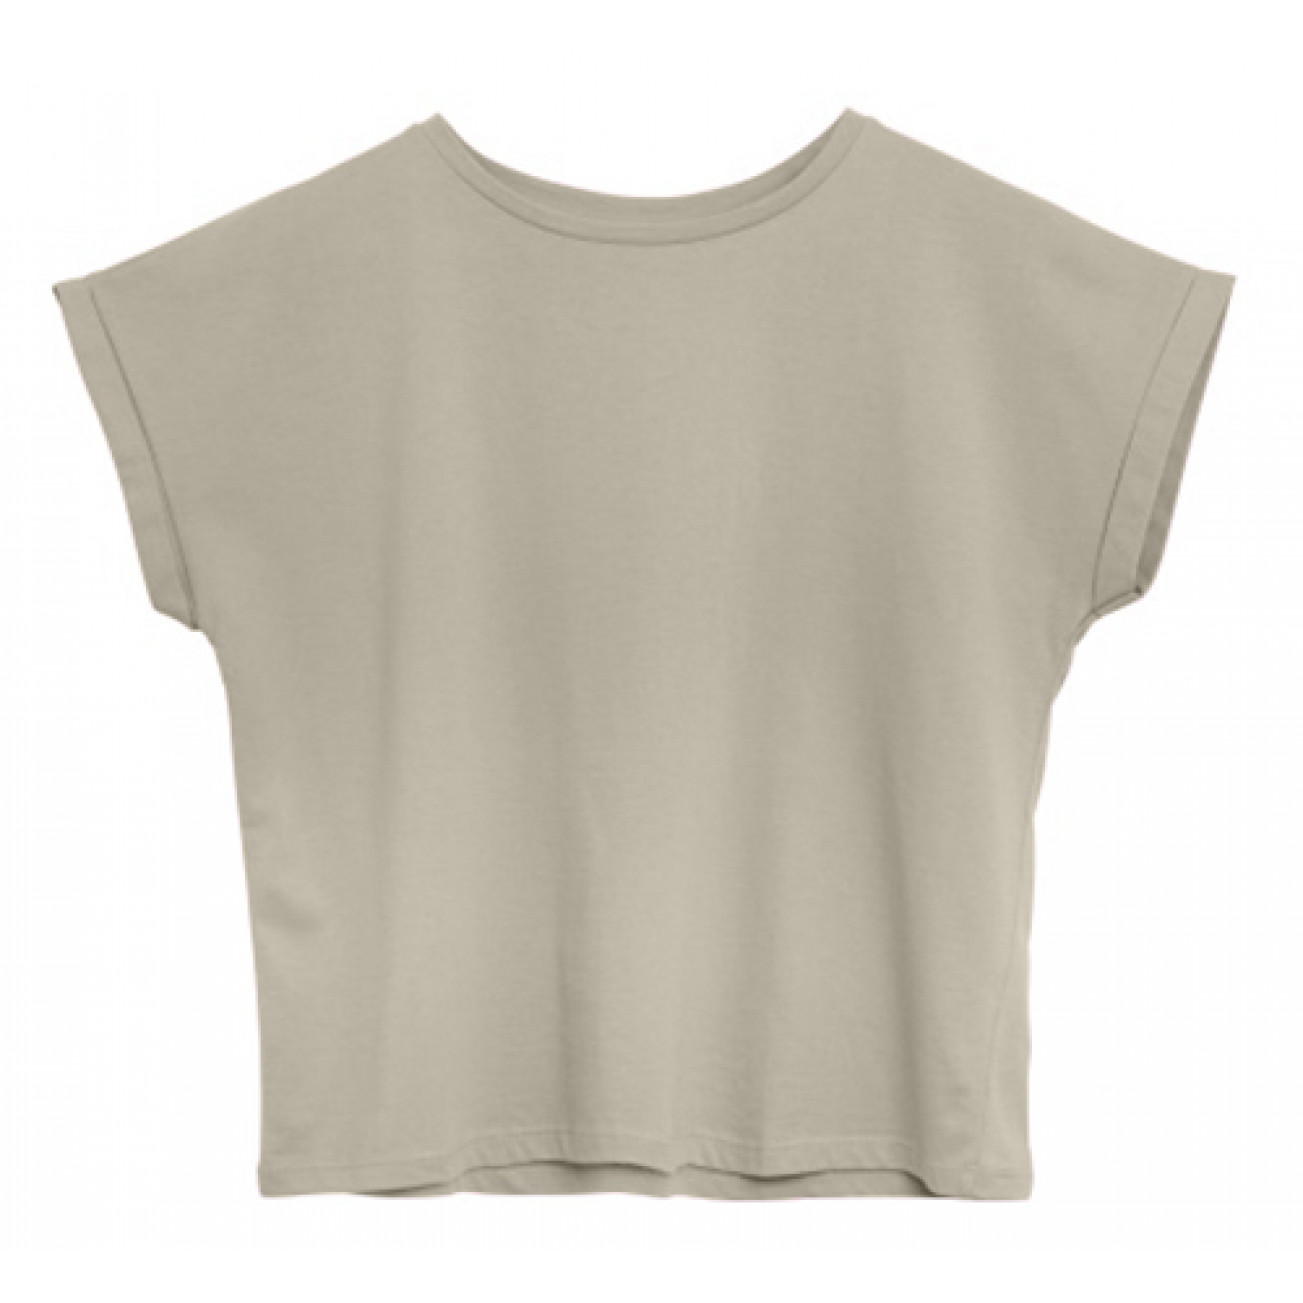 T-Shirt Baumwolle   Beige Organic